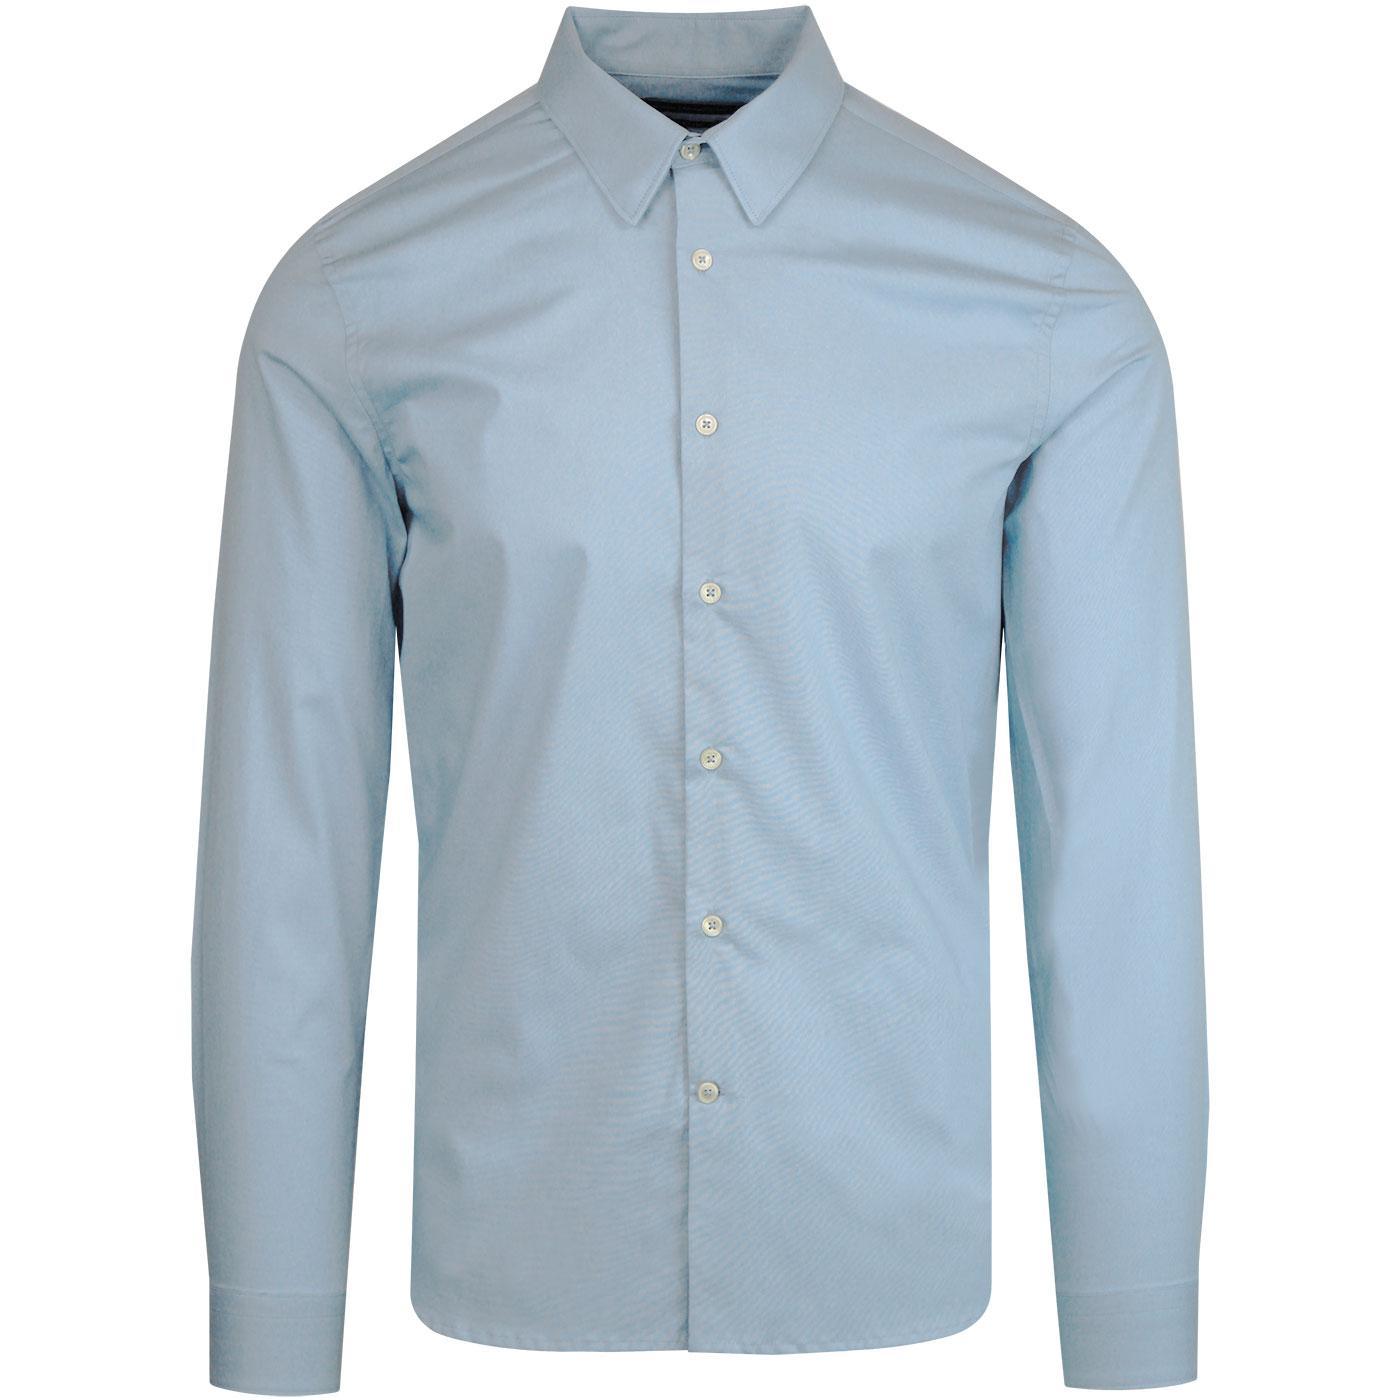 FRENCH CONNECTION Retro Stretch Poplin Shirt BLUE